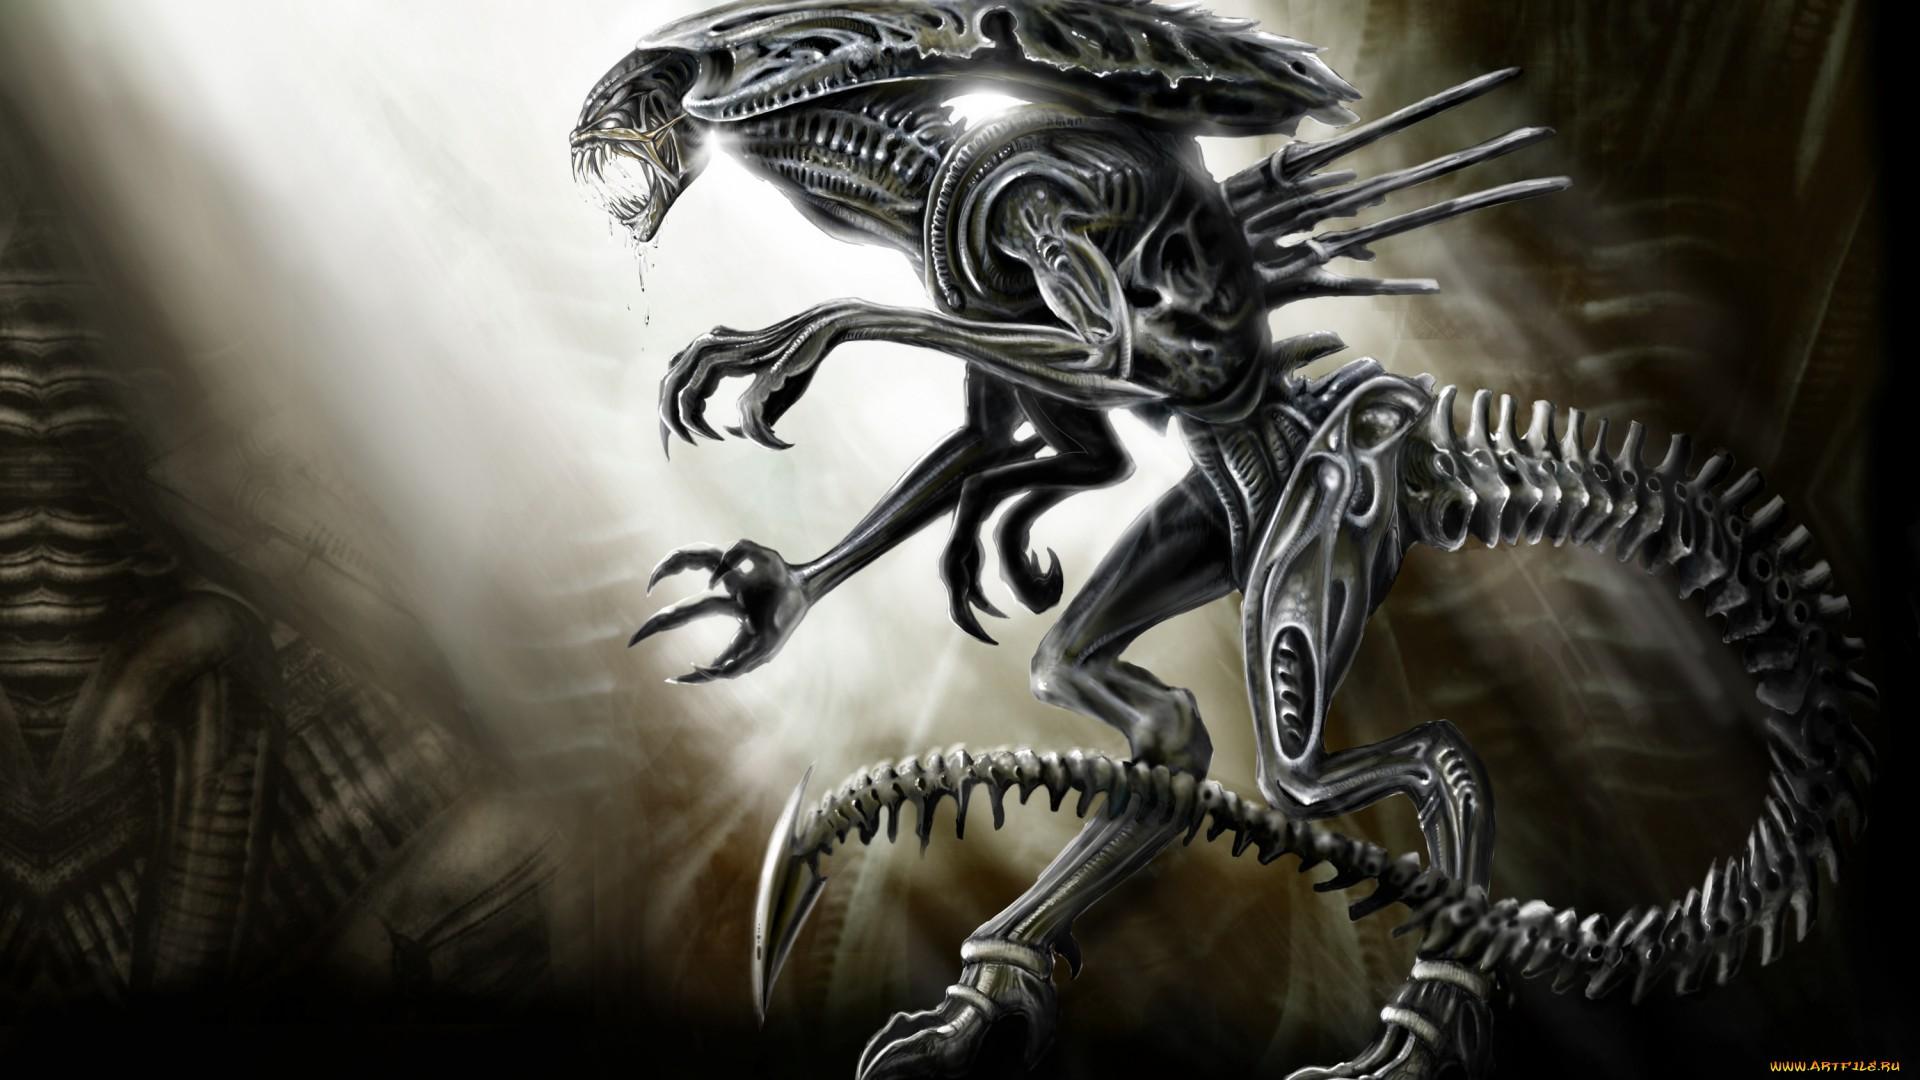 alien hd iphone wallpapers - photo #38